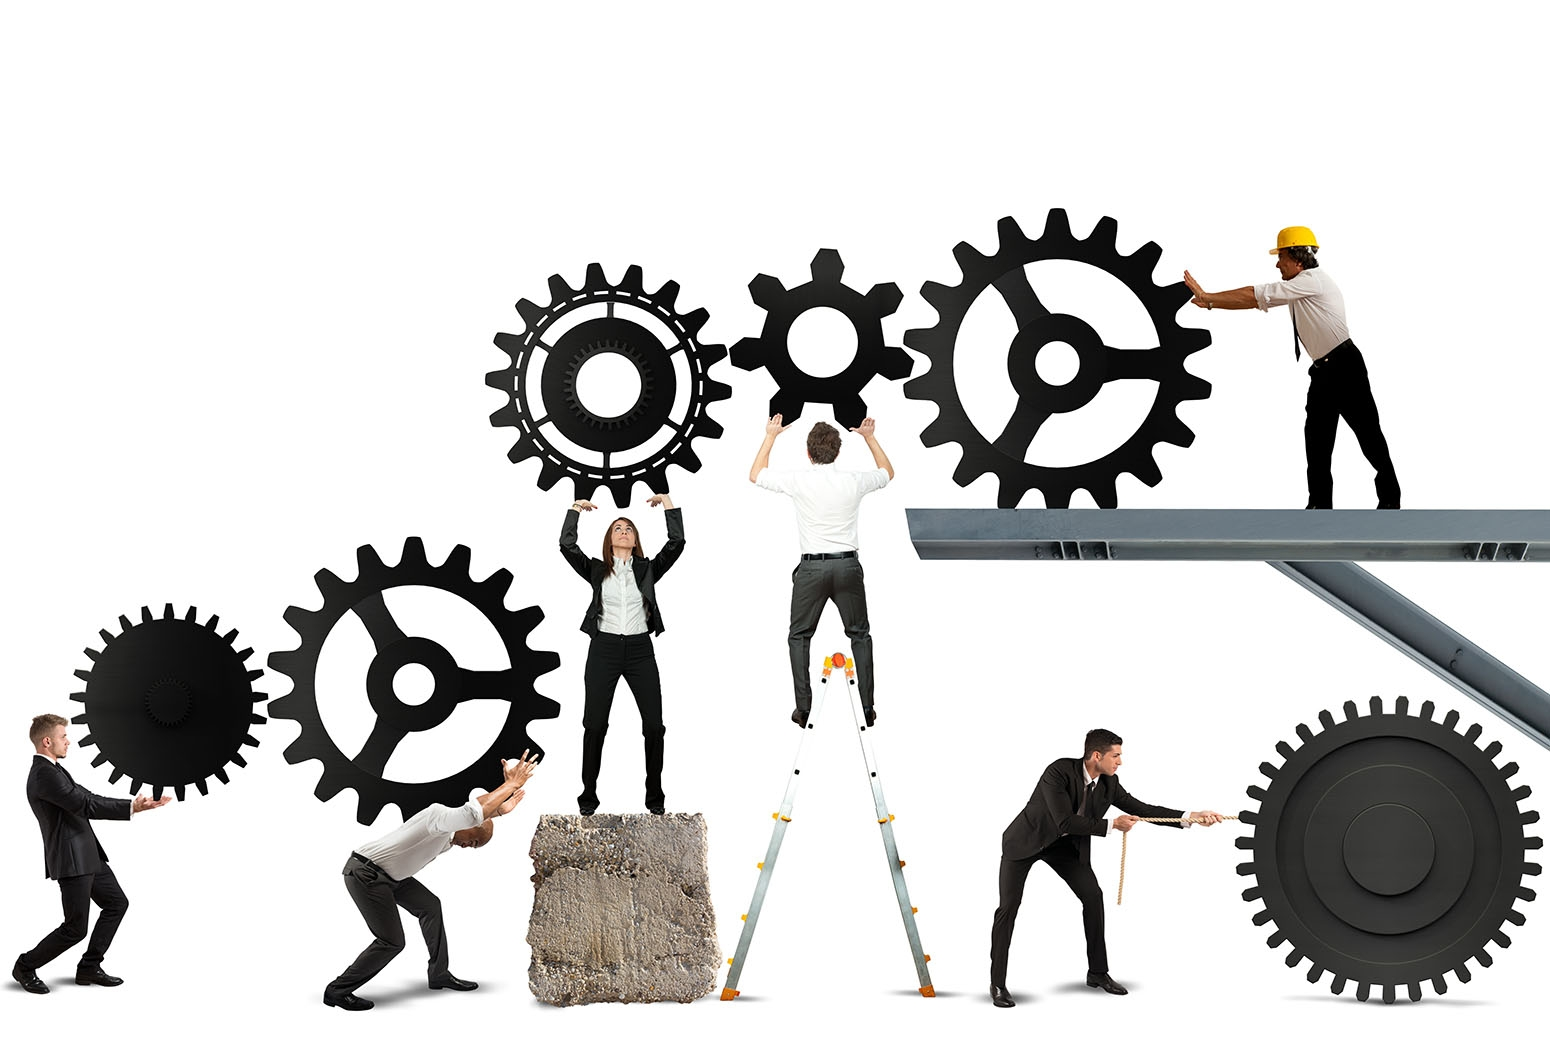 Teamwork visual.jpg